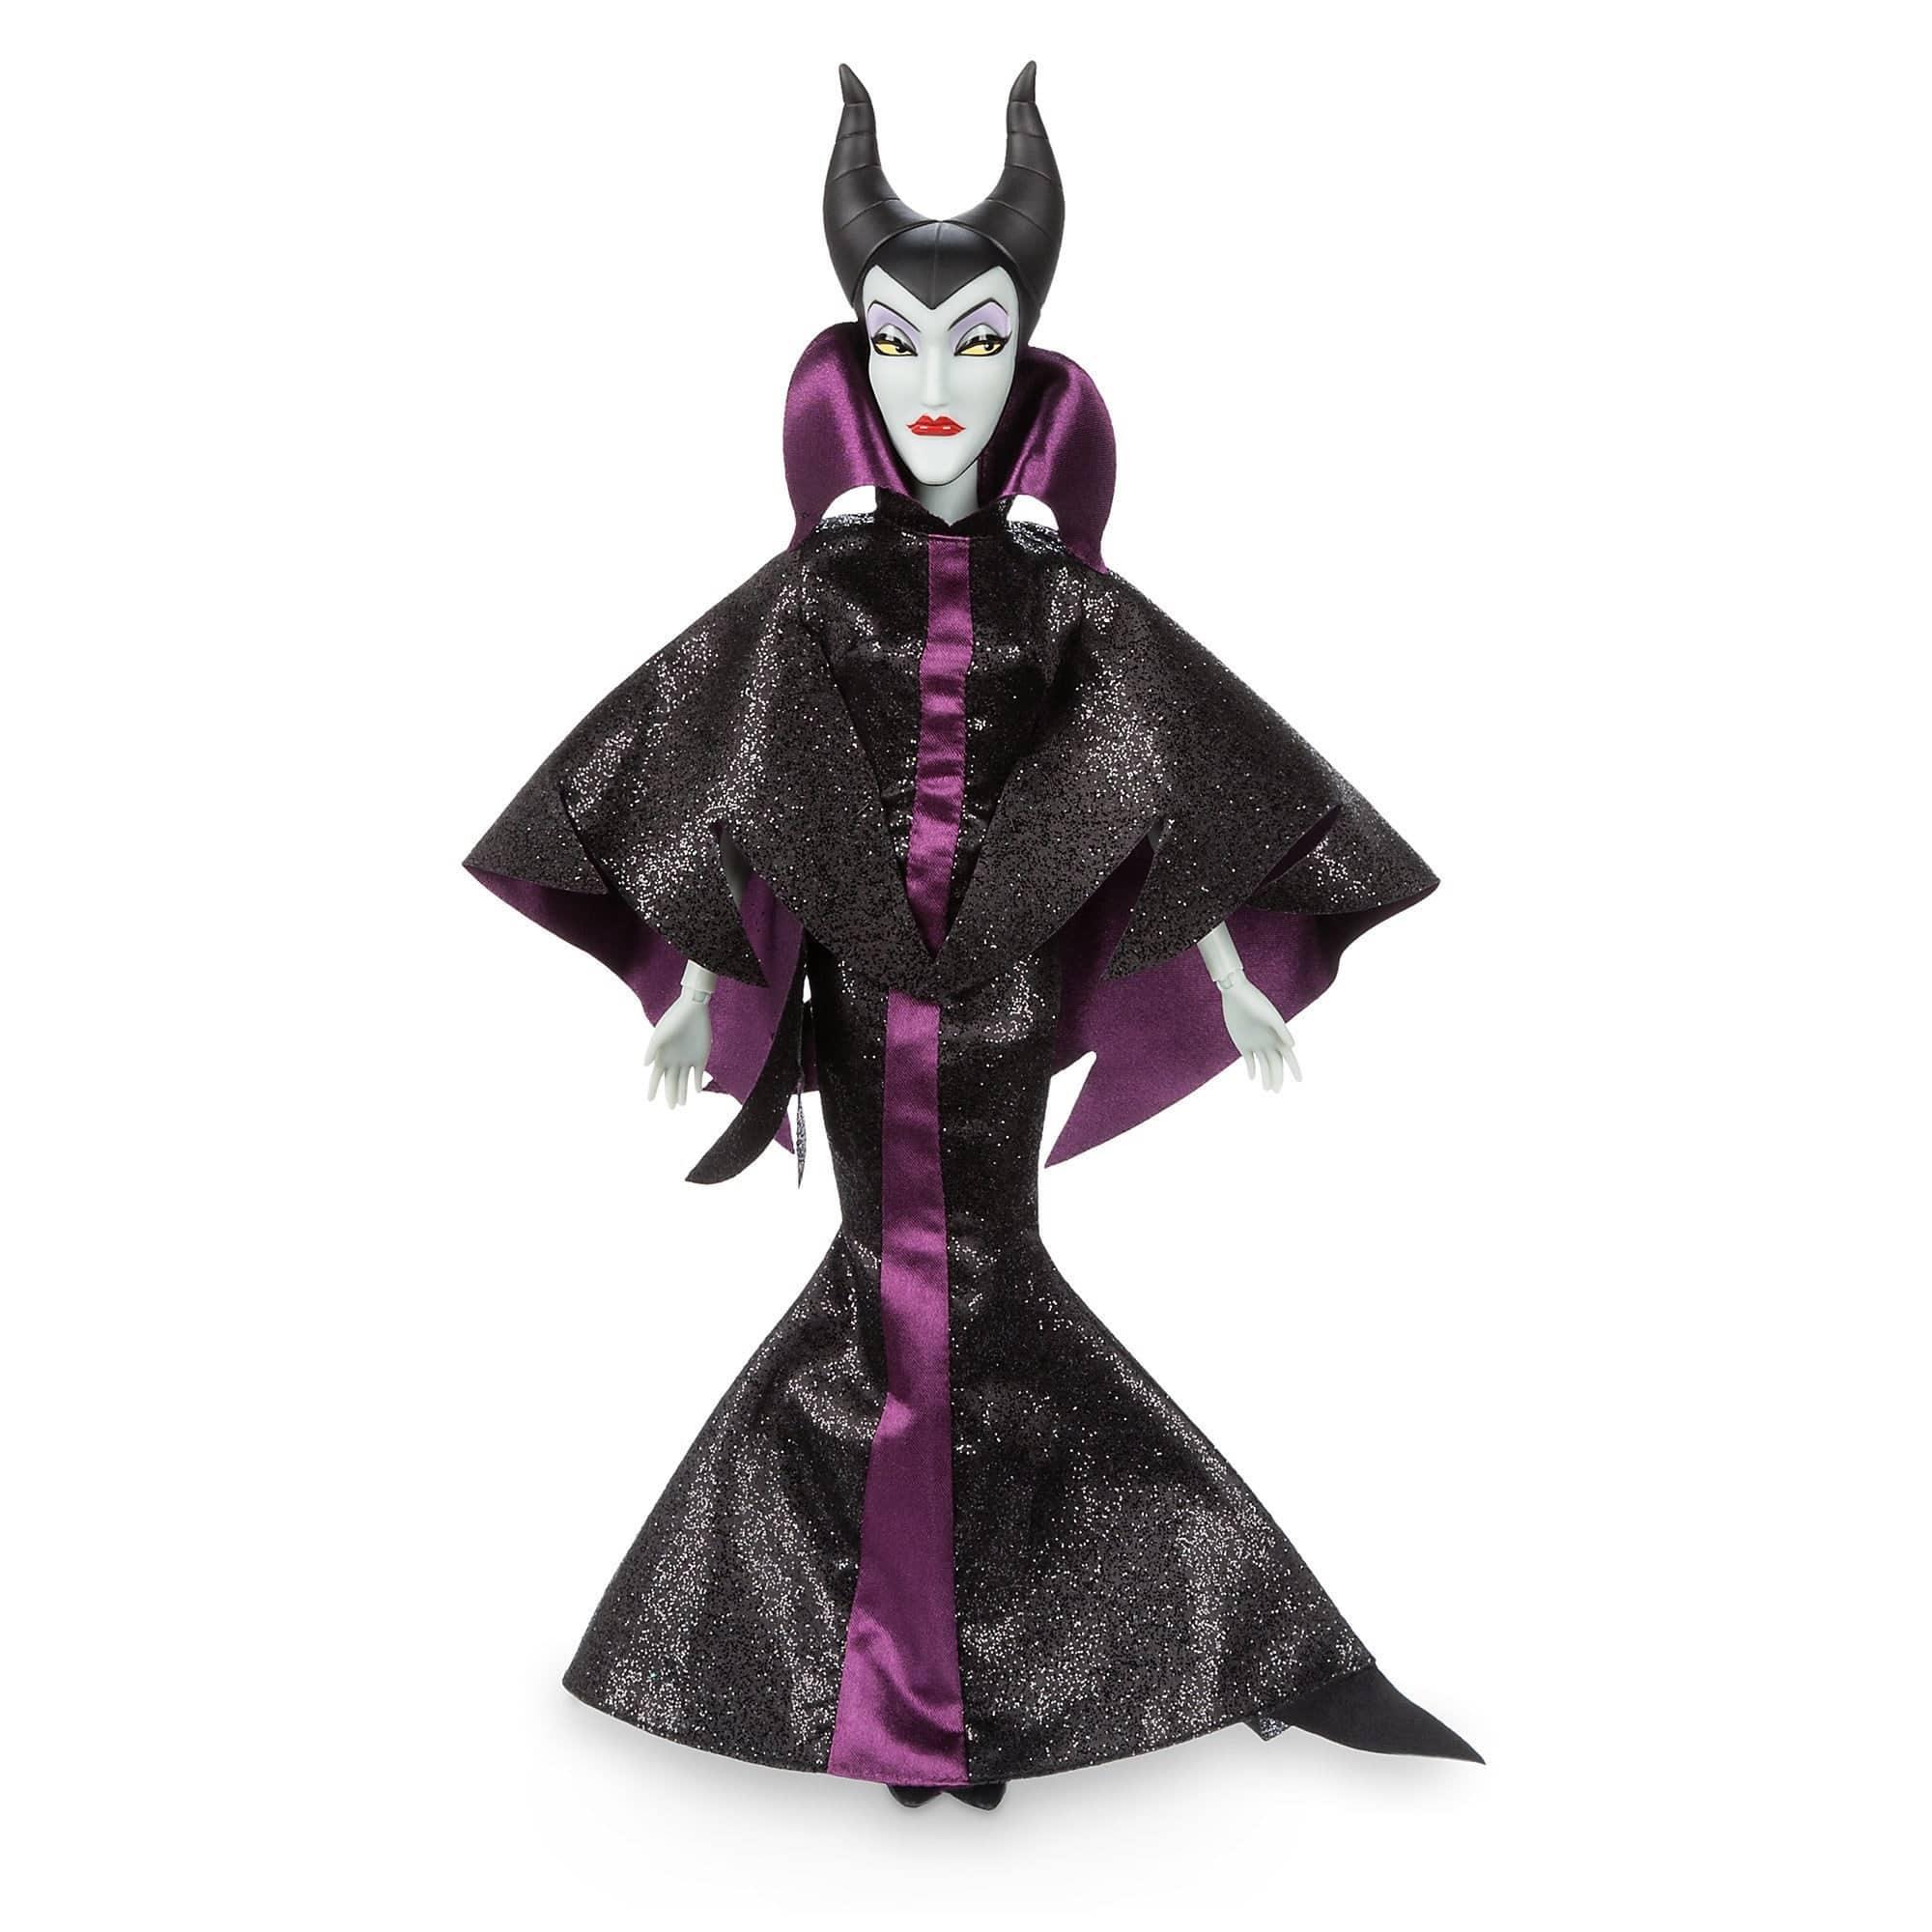 Boneca Malévola (Maleficent Classic): A Bela Adormecida (Sleeping Beauty) - Disney Store